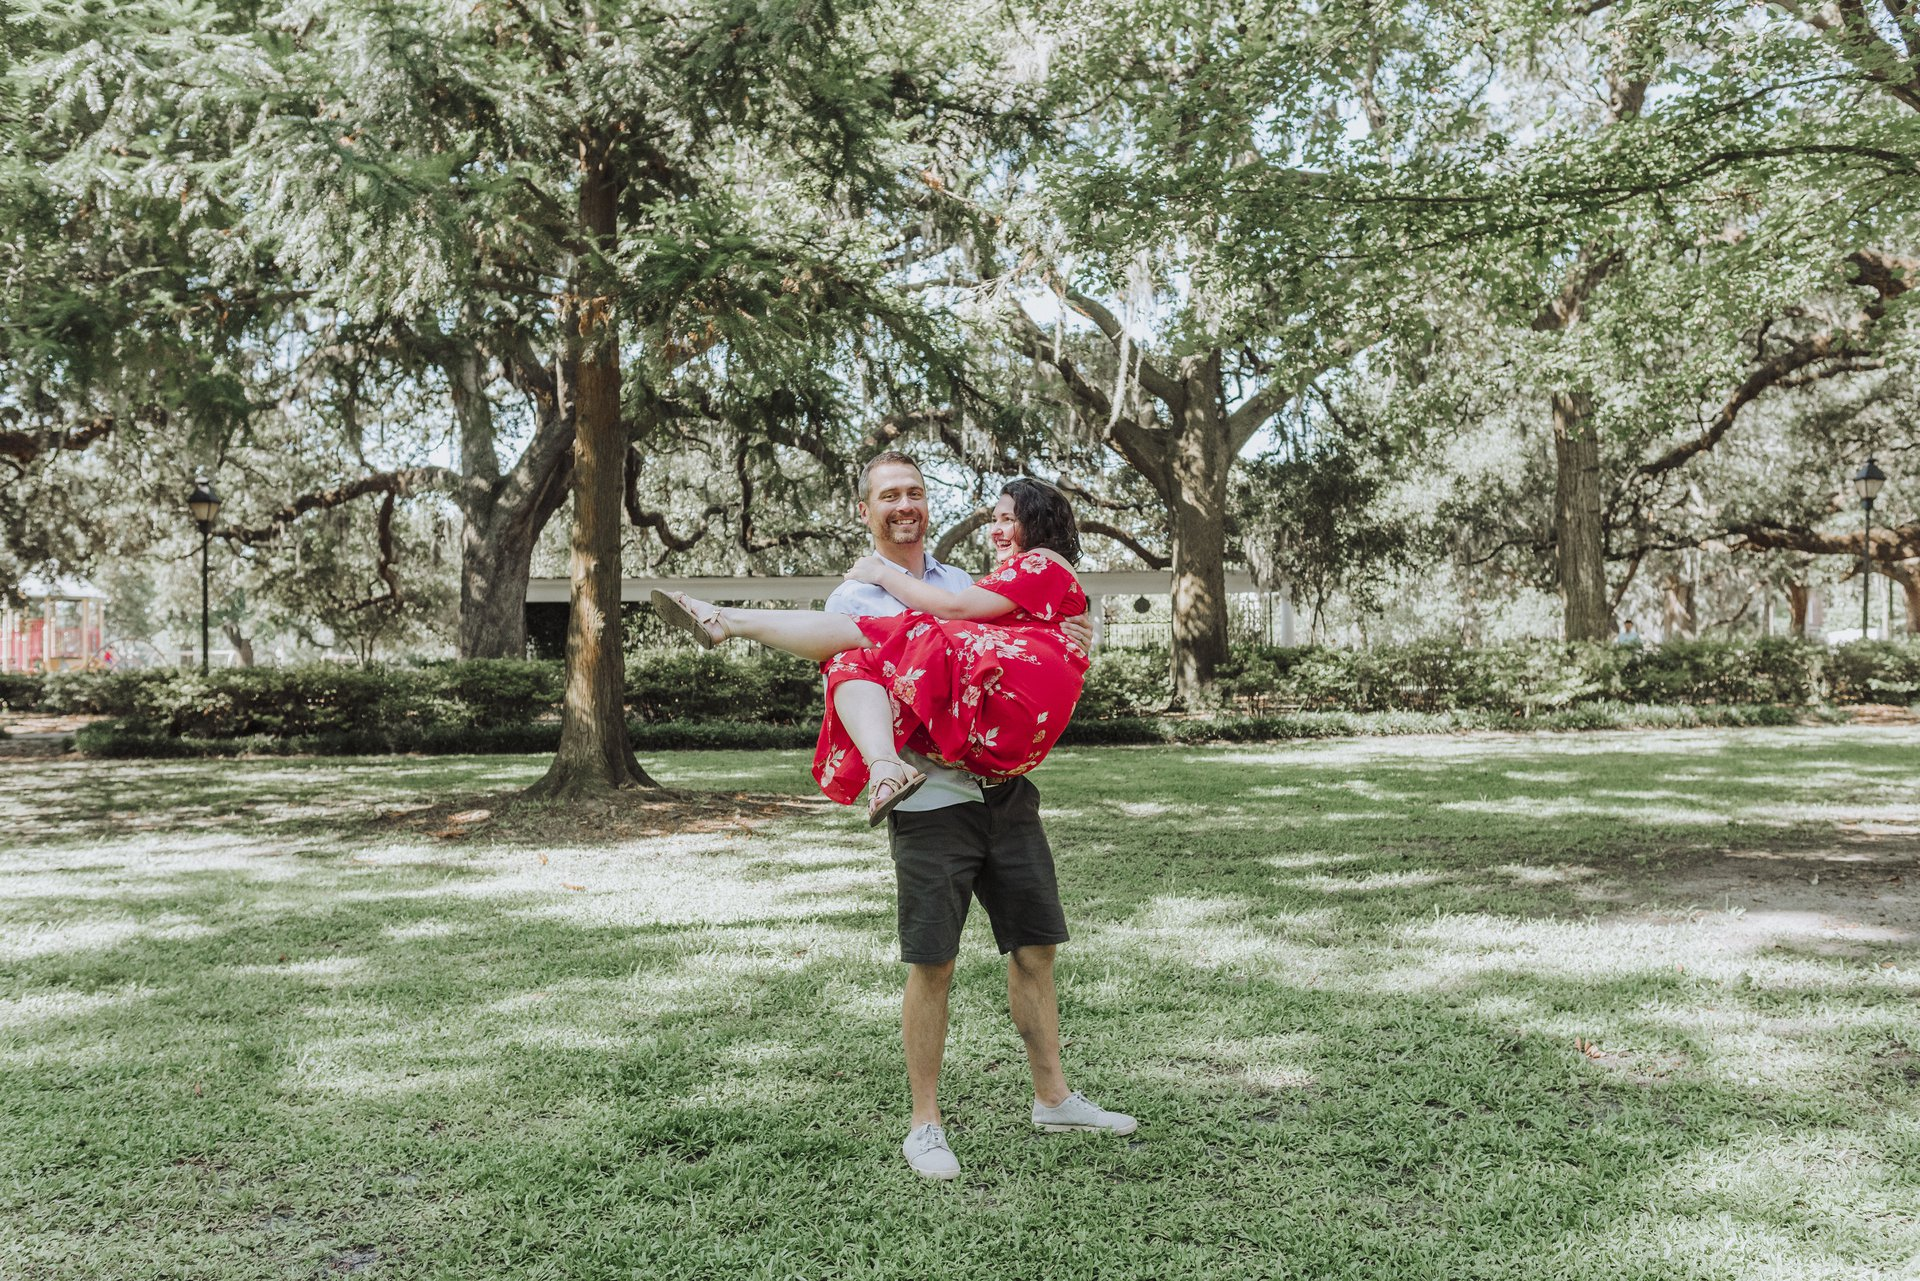 Savannah-United States-travel-story-Flytographer-28